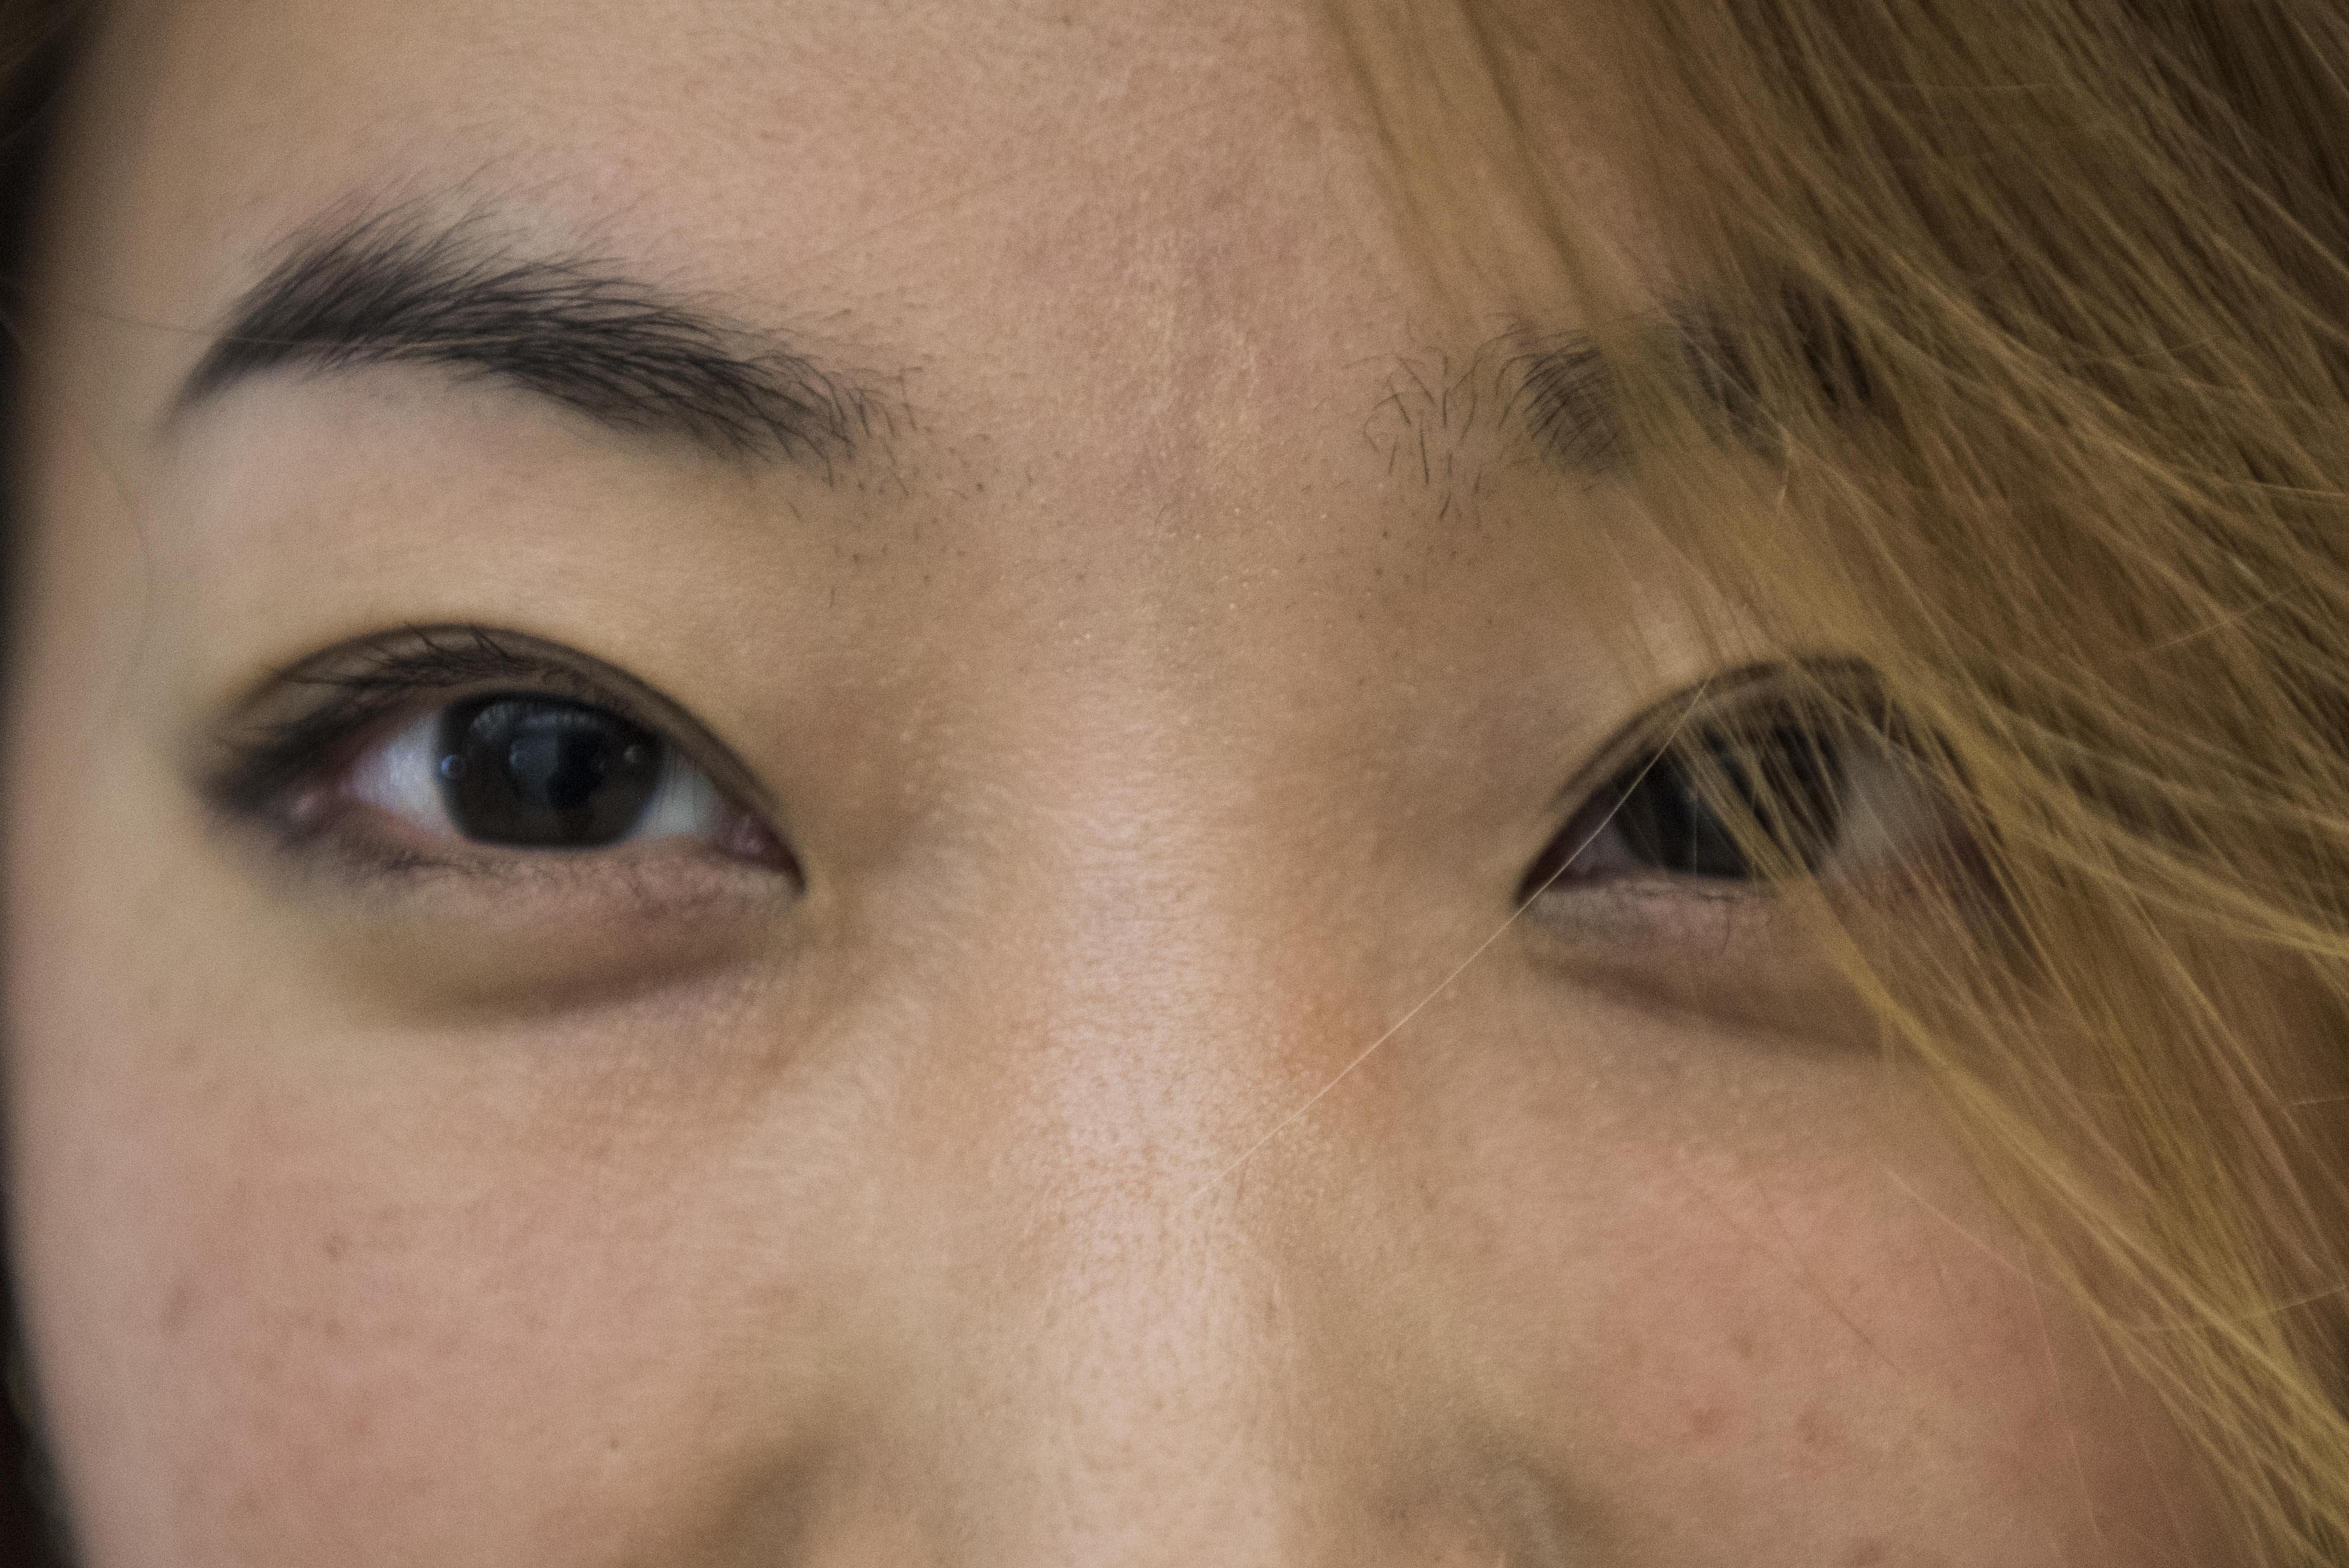 Eyes So Low Look Like An Asian